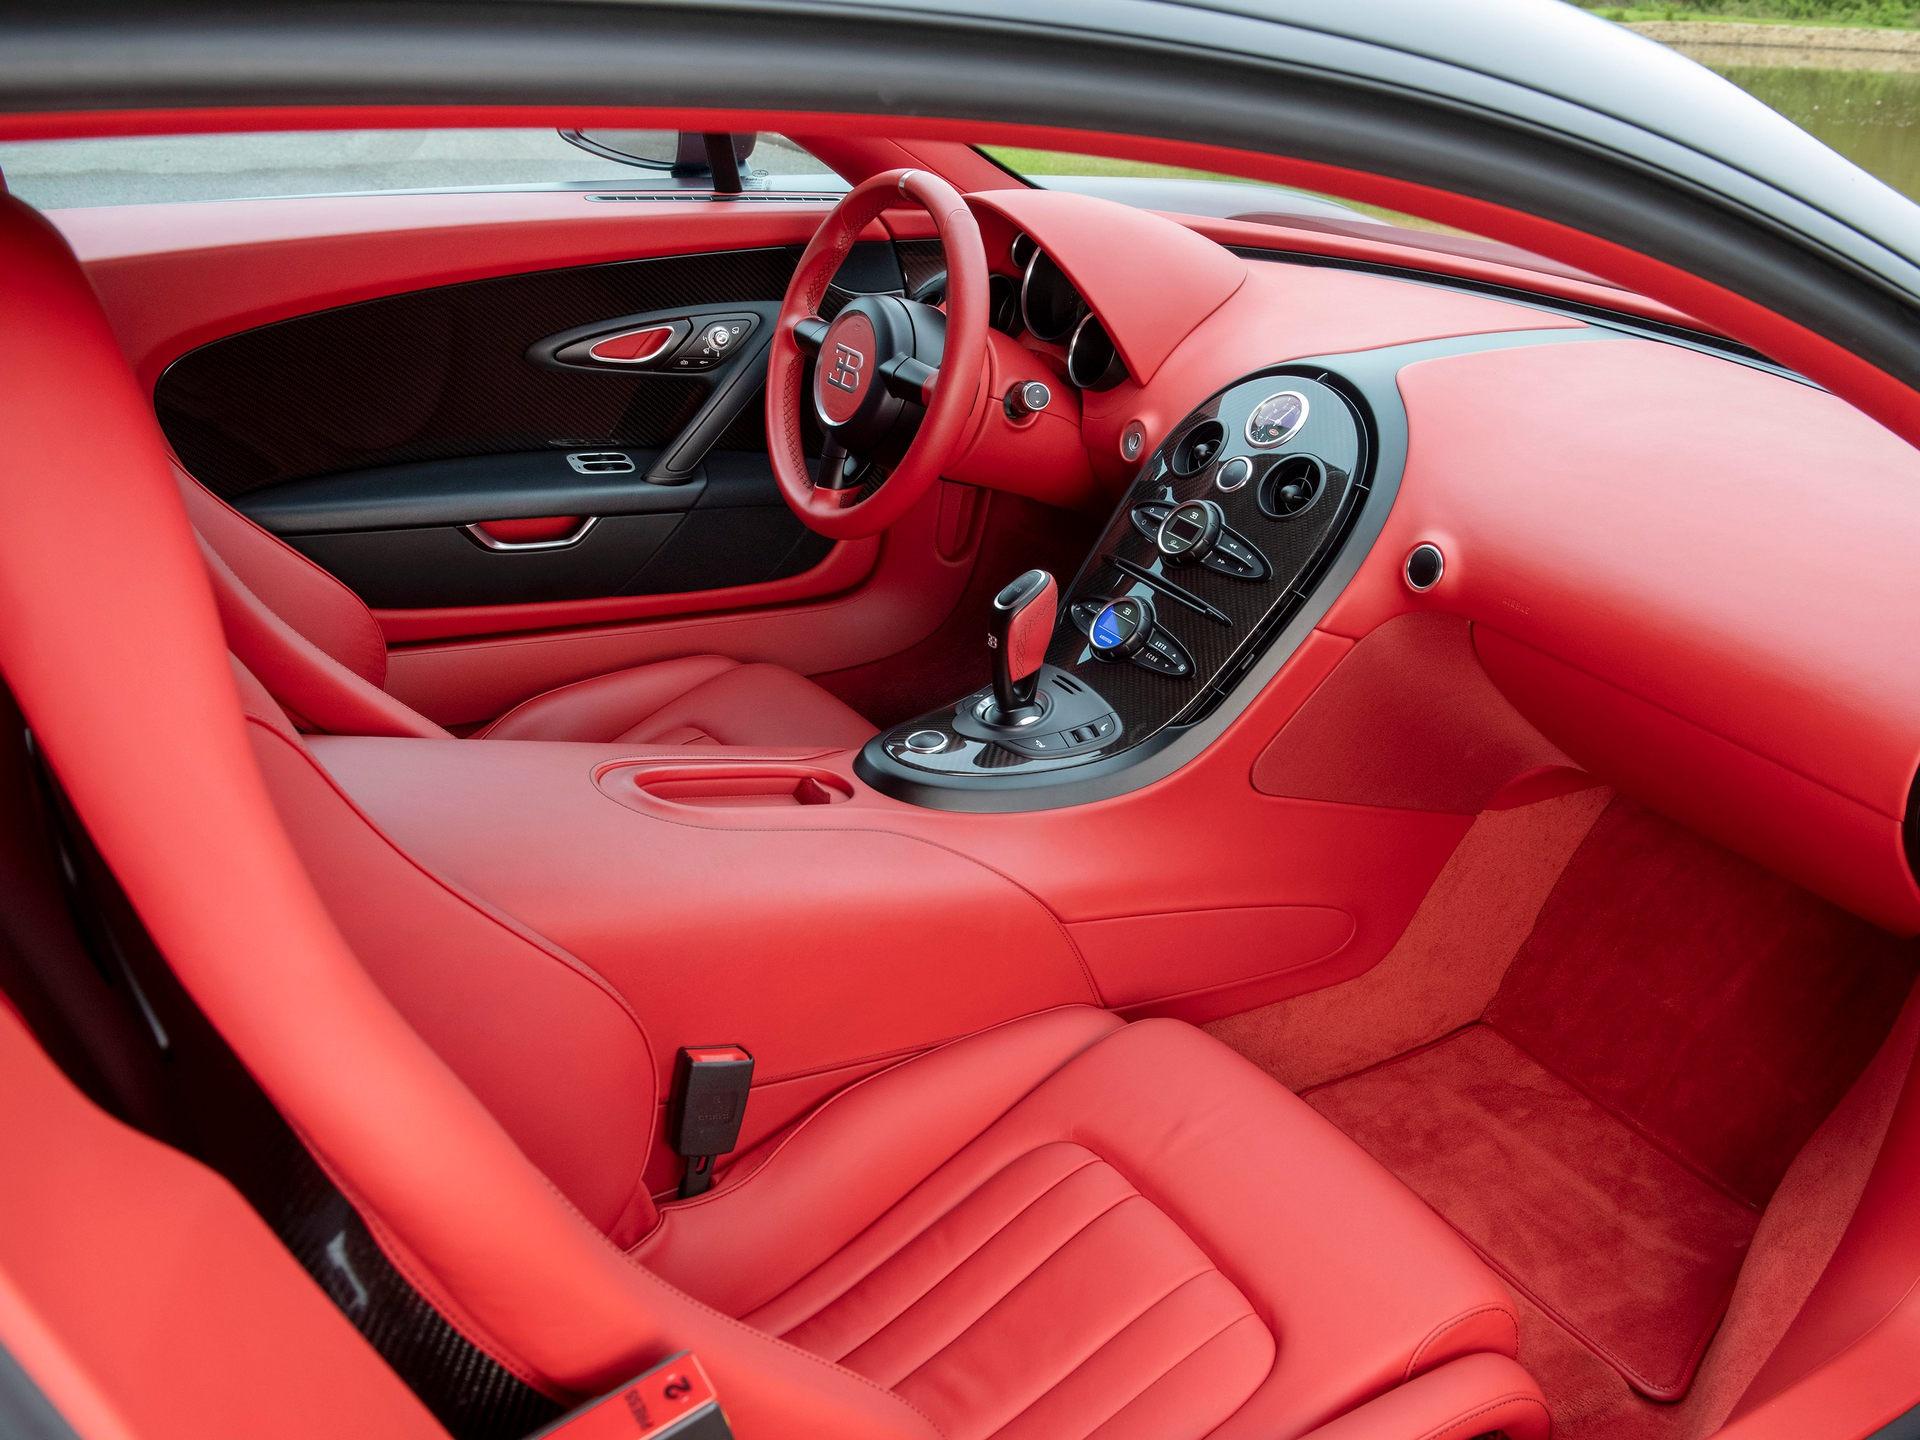 Bugatti Veyron Super Sport cuoi cung duoc rao ban anh 5